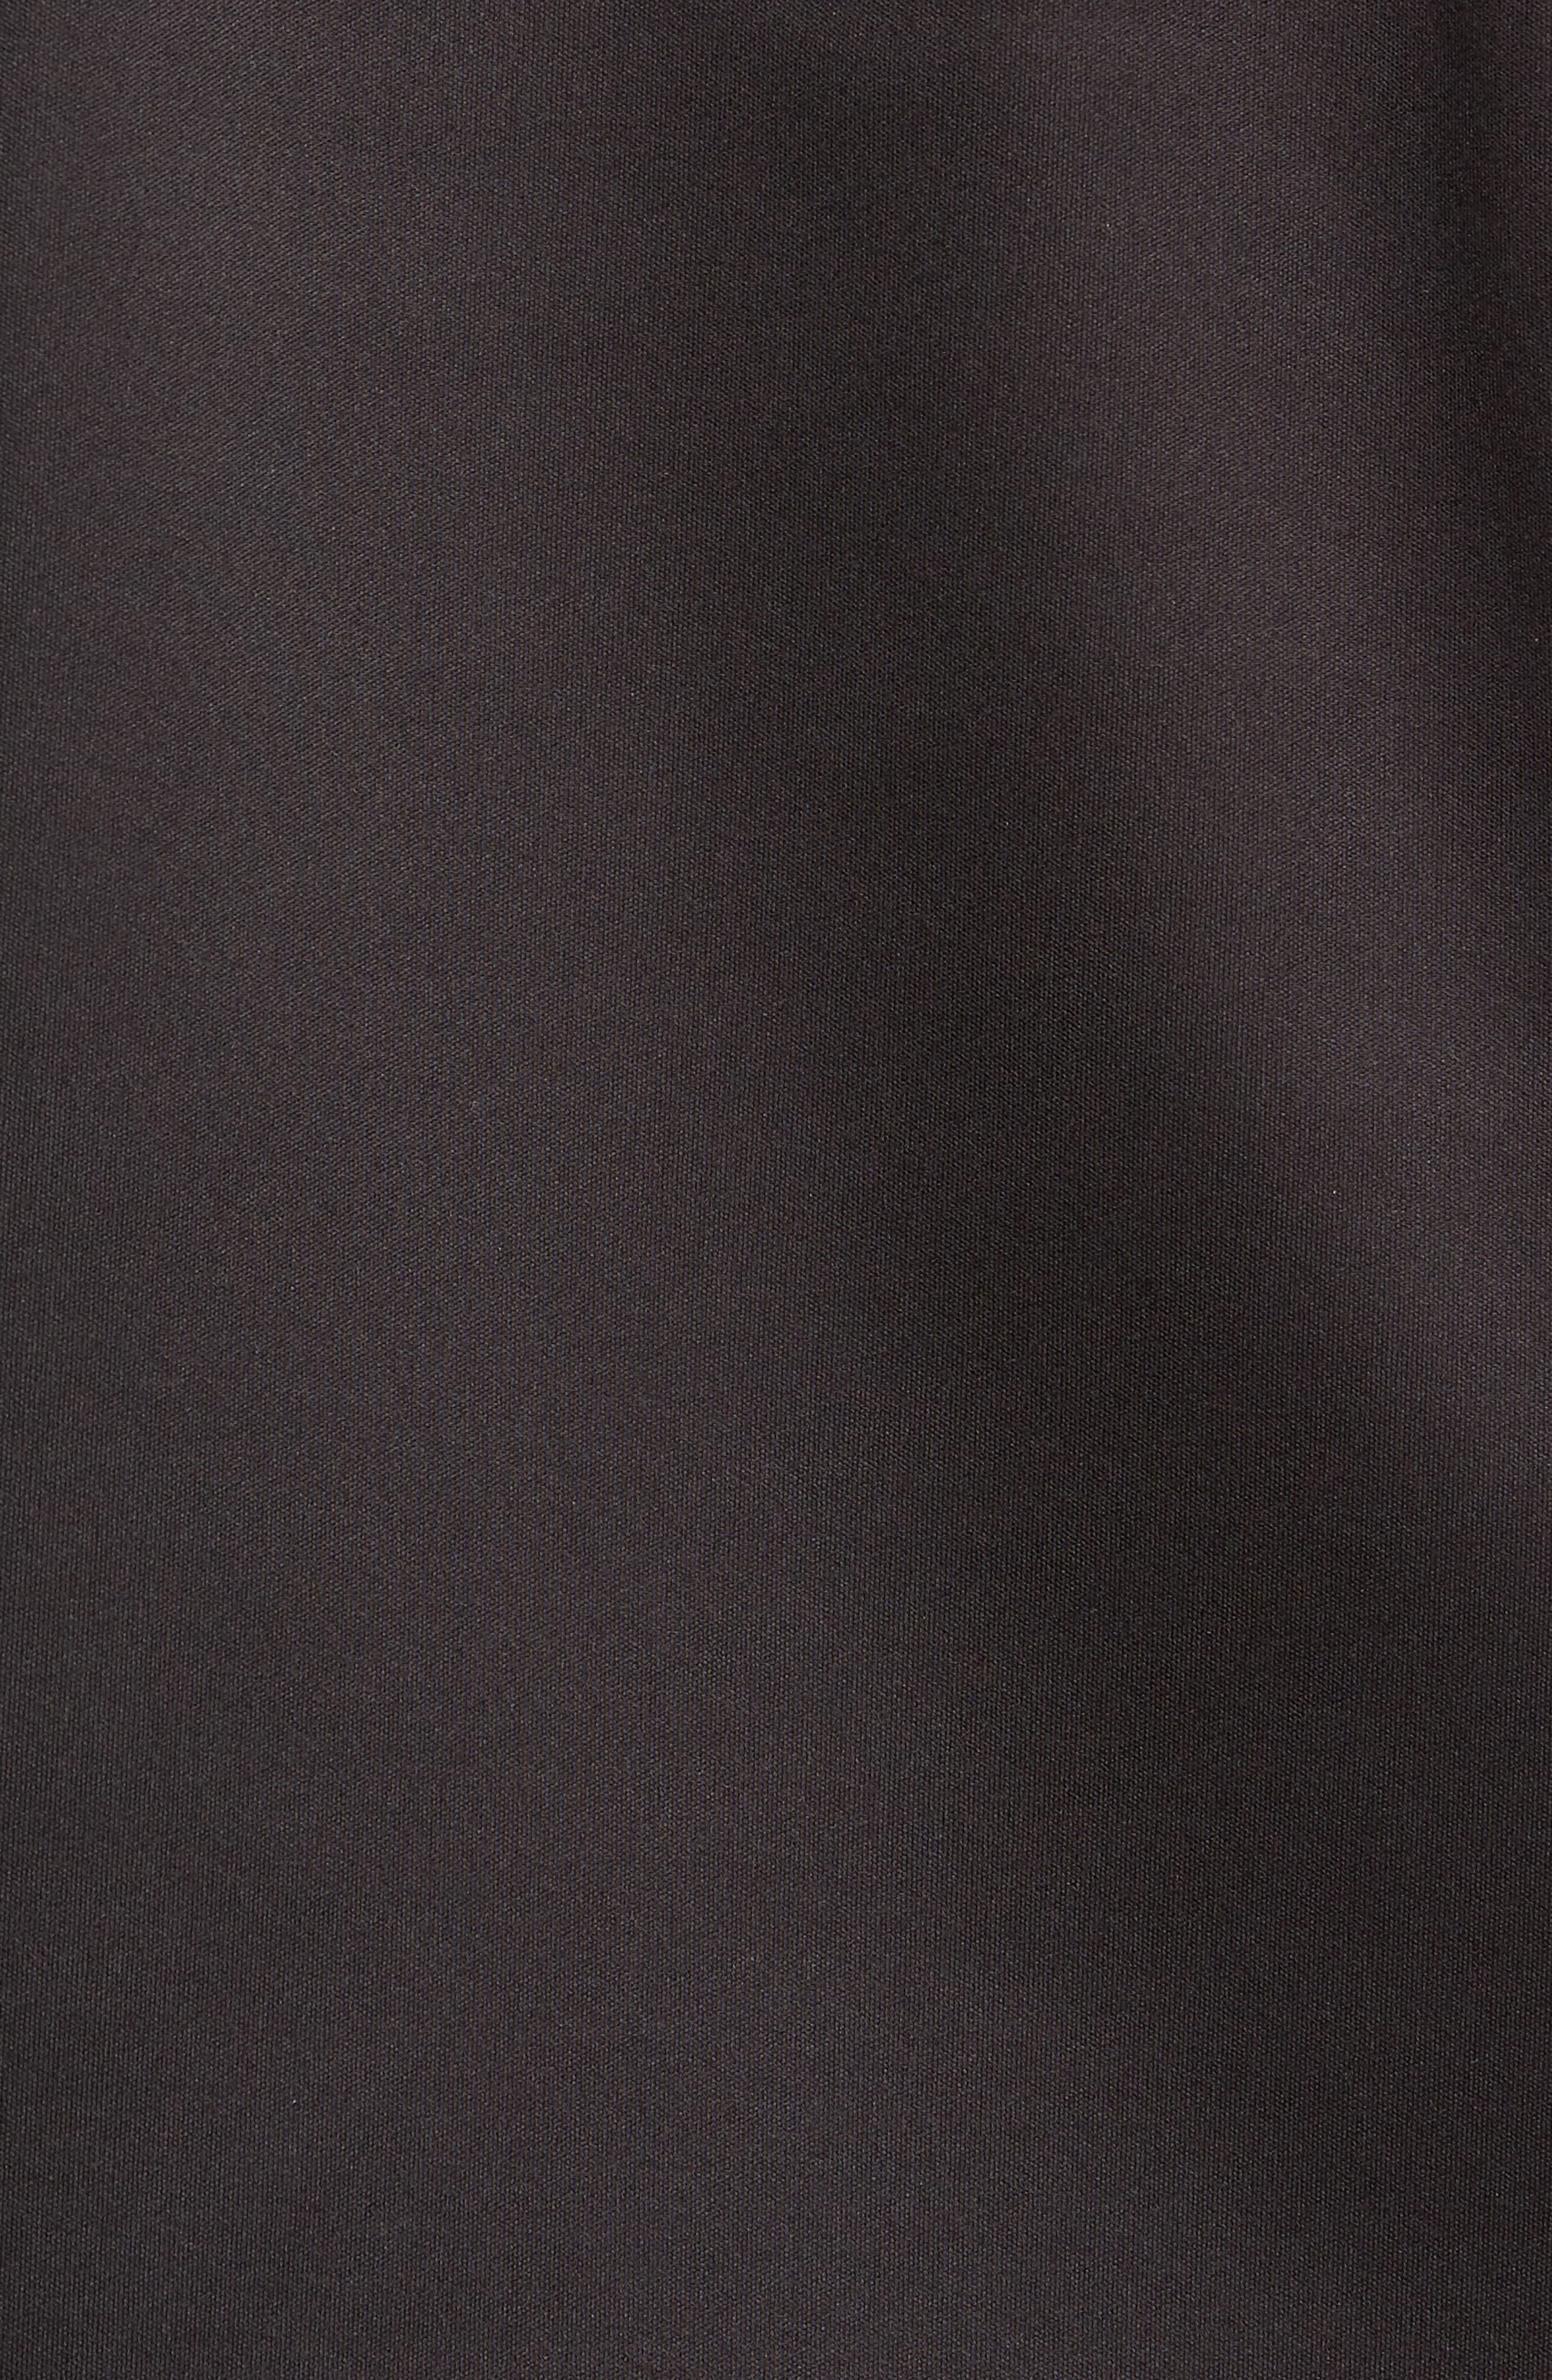 THE NORTH FACE, Apex Risor Jacket, Alternate thumbnail 6, color, 001